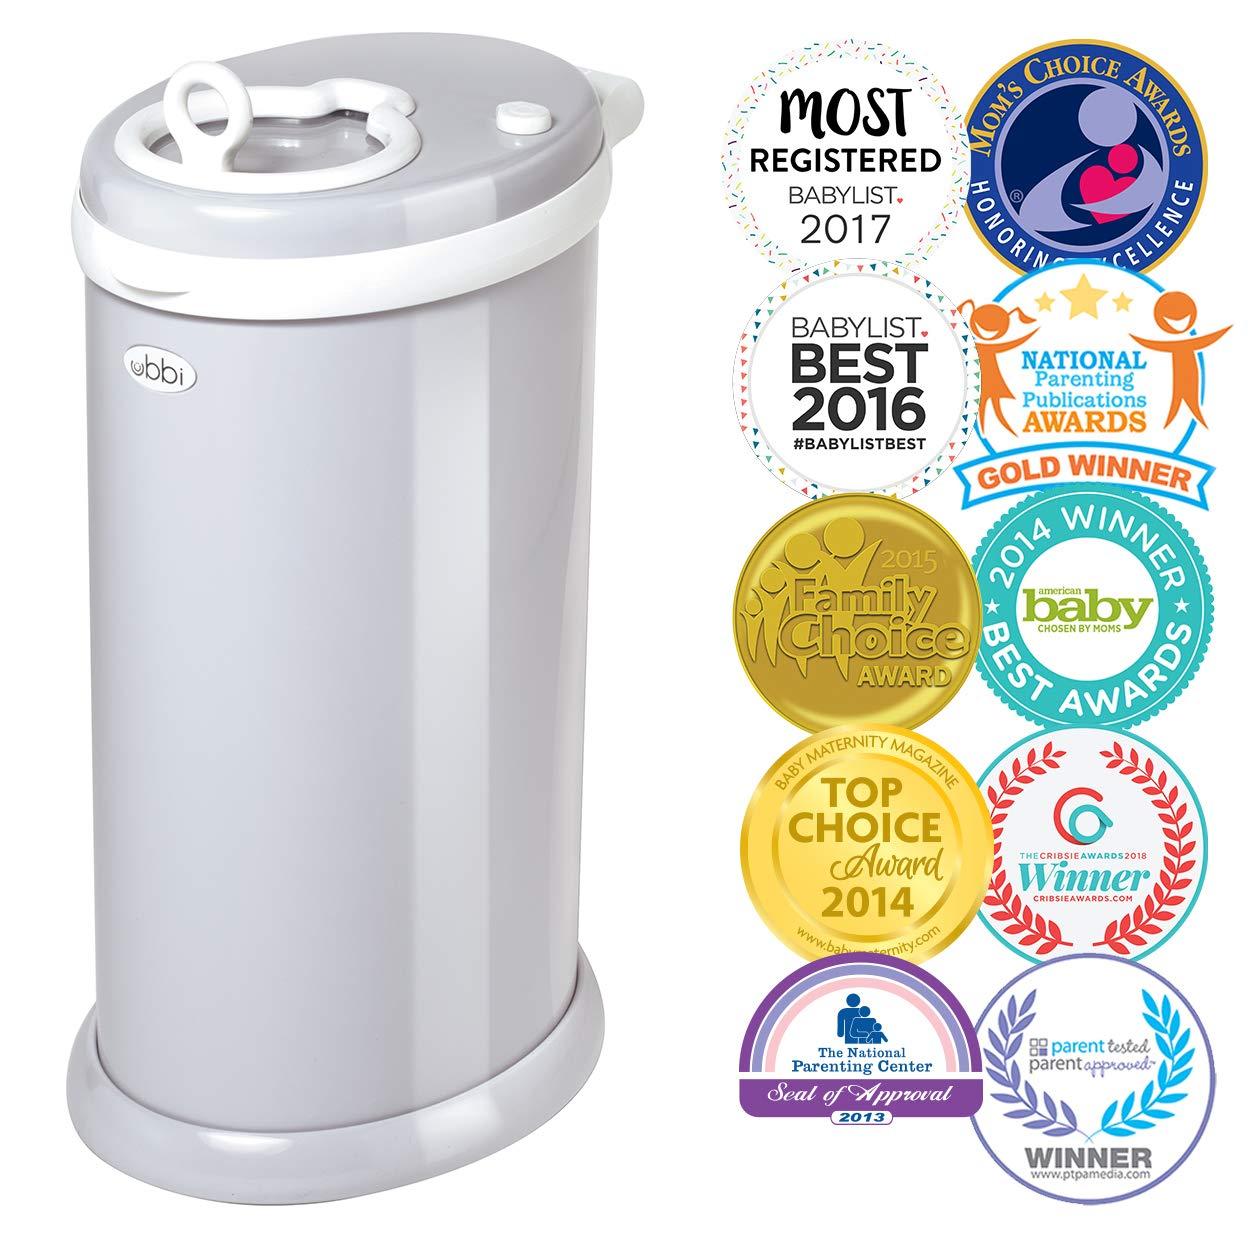 Ubbi Steel Odor Locking, No Special Bag Required Money Saving, Awards-Winning, Modern Design Registry Must-Have Diaper Pail, Gray by Ubbi